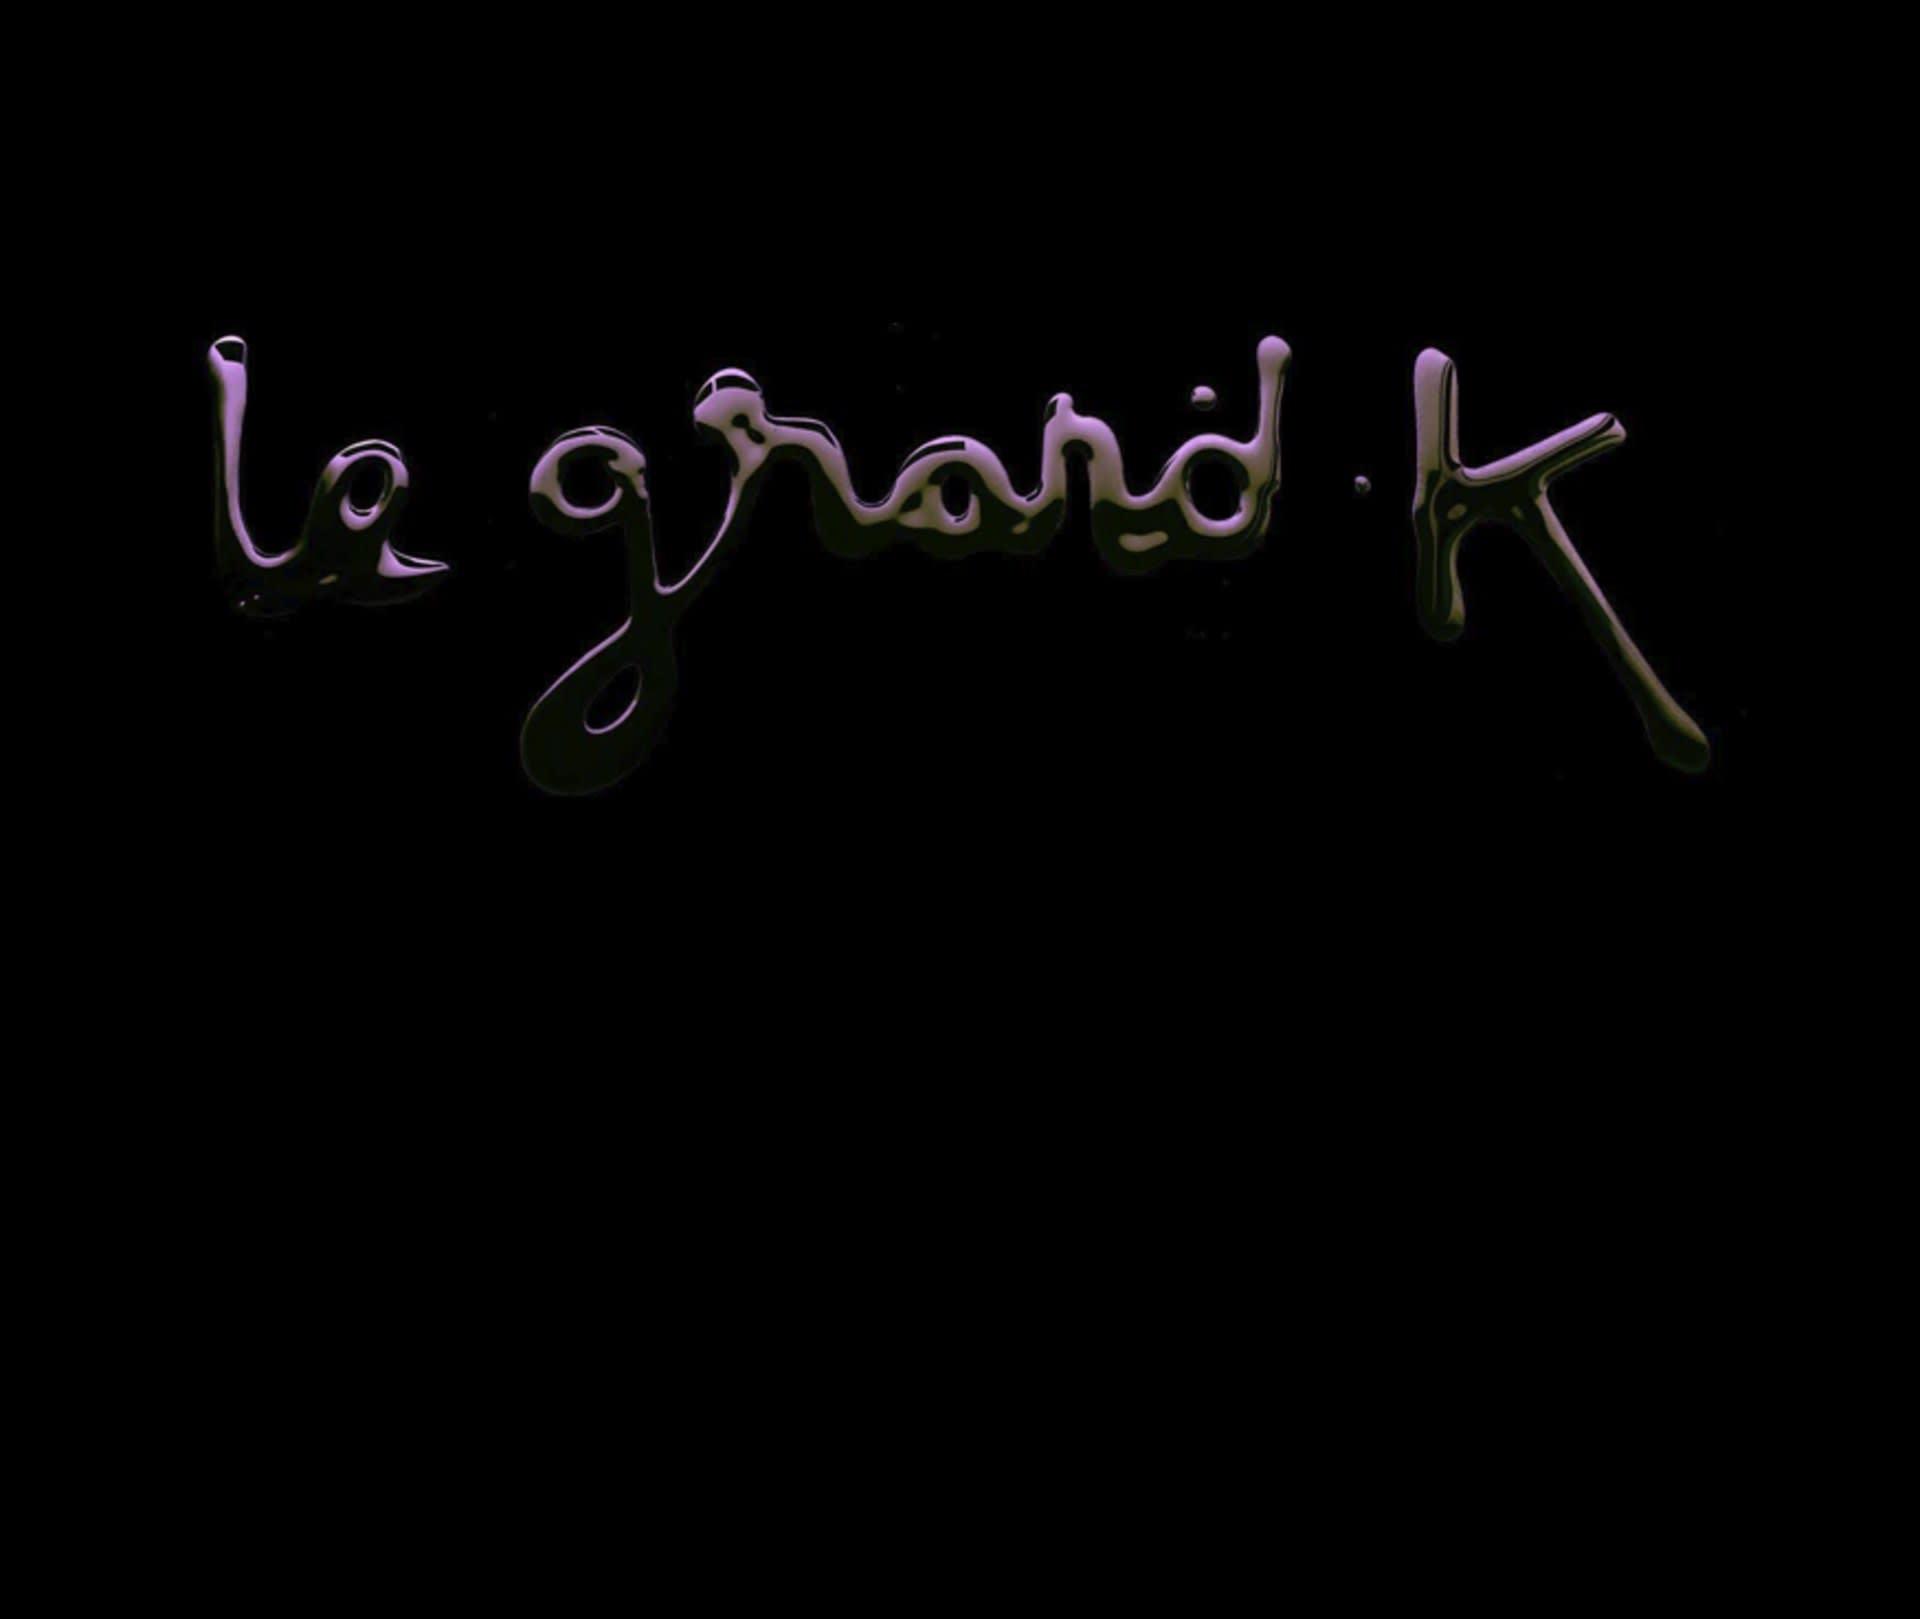 Le Grand K